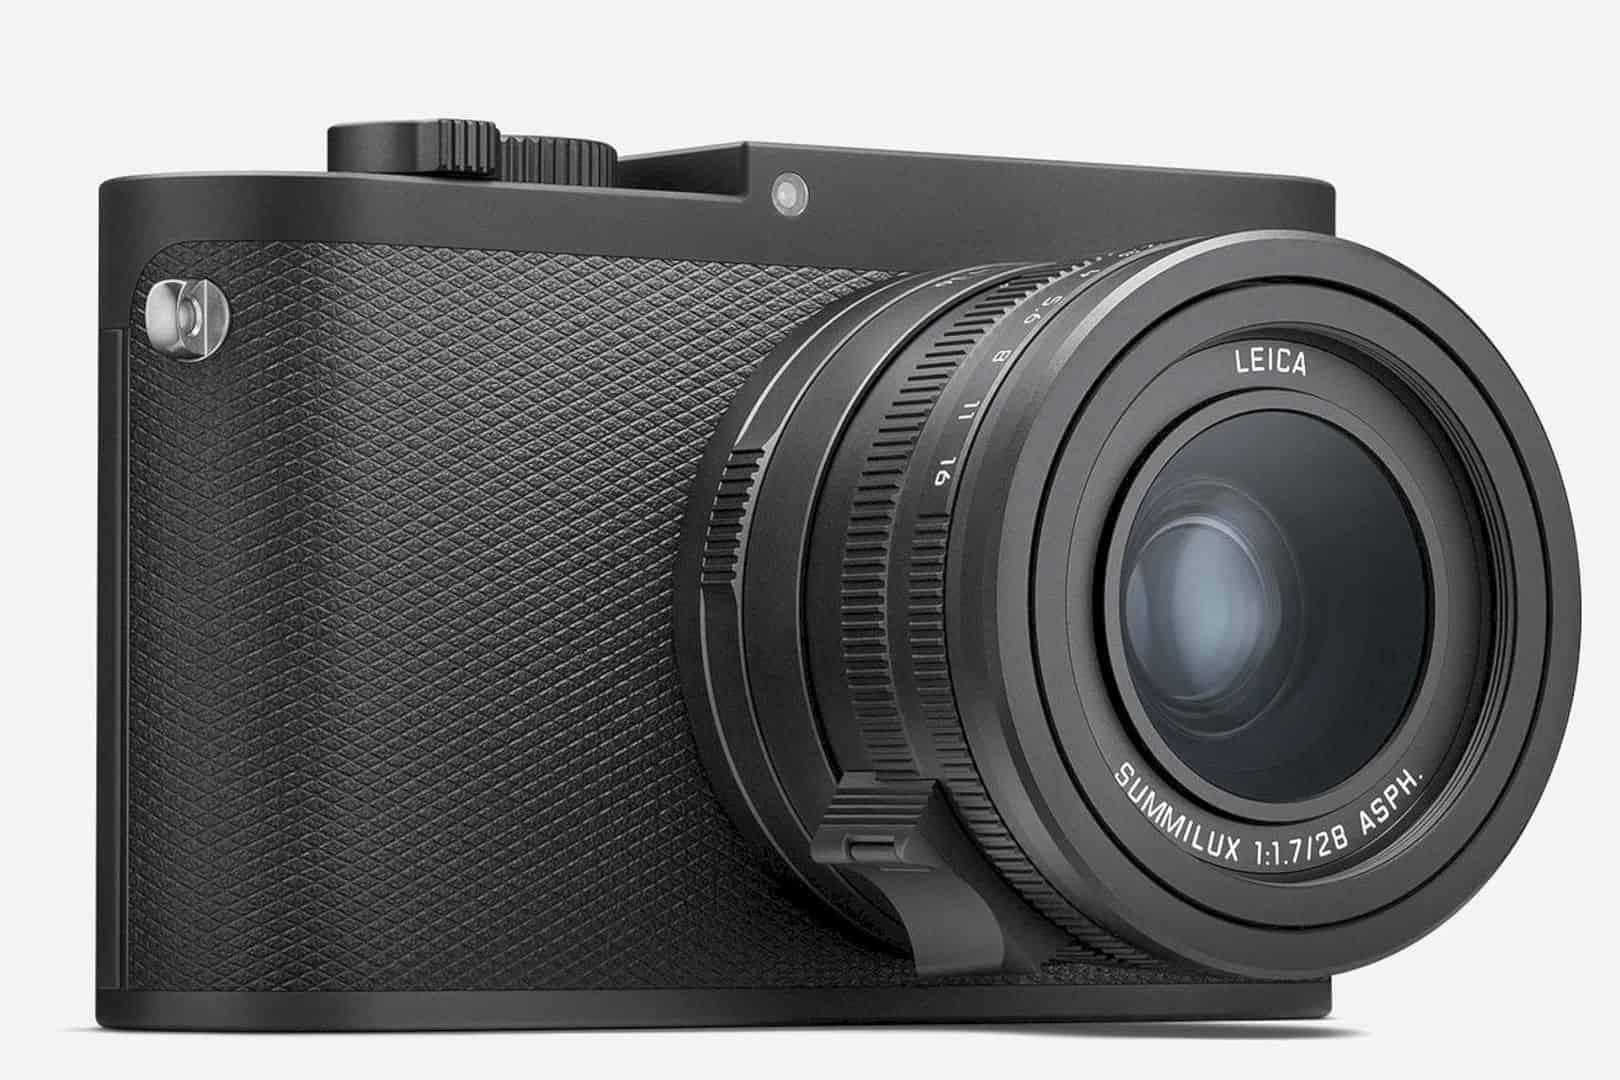 Leica Q P 6